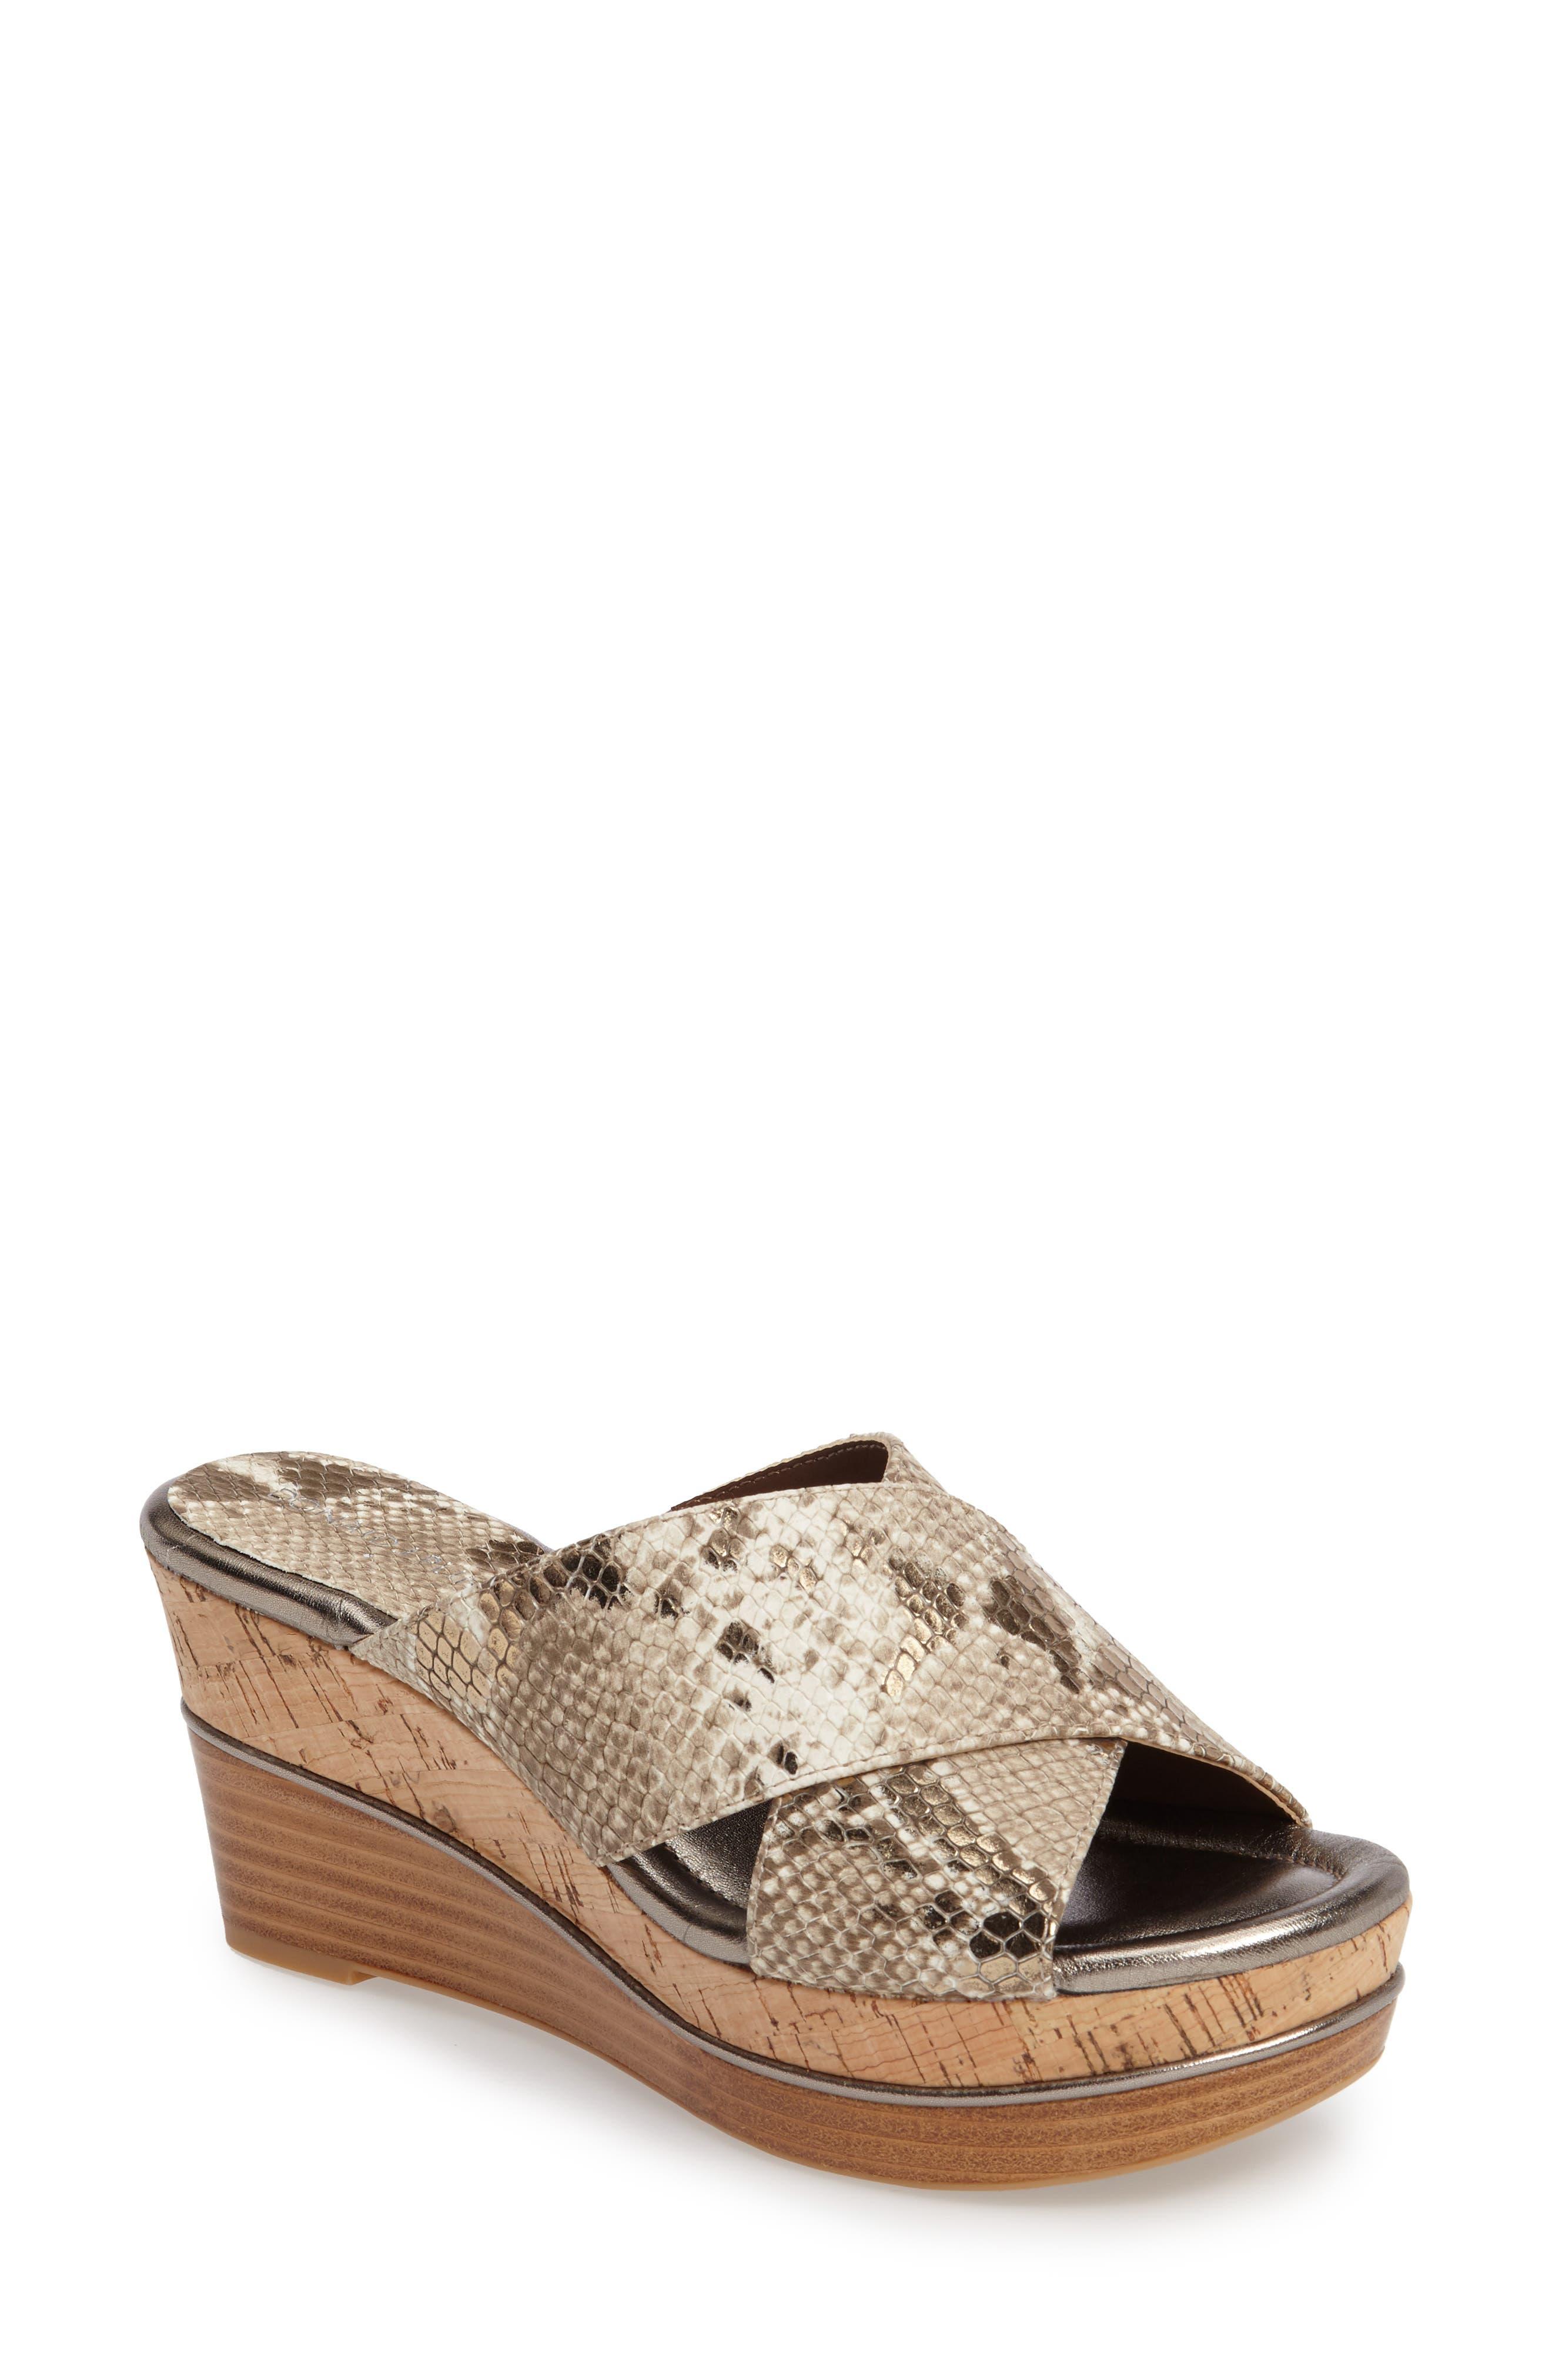 Donald J Pliner 'Dani' Crisscross Wedge Sandal,                             Main thumbnail 1, color,                             Light Bronze Print Leather